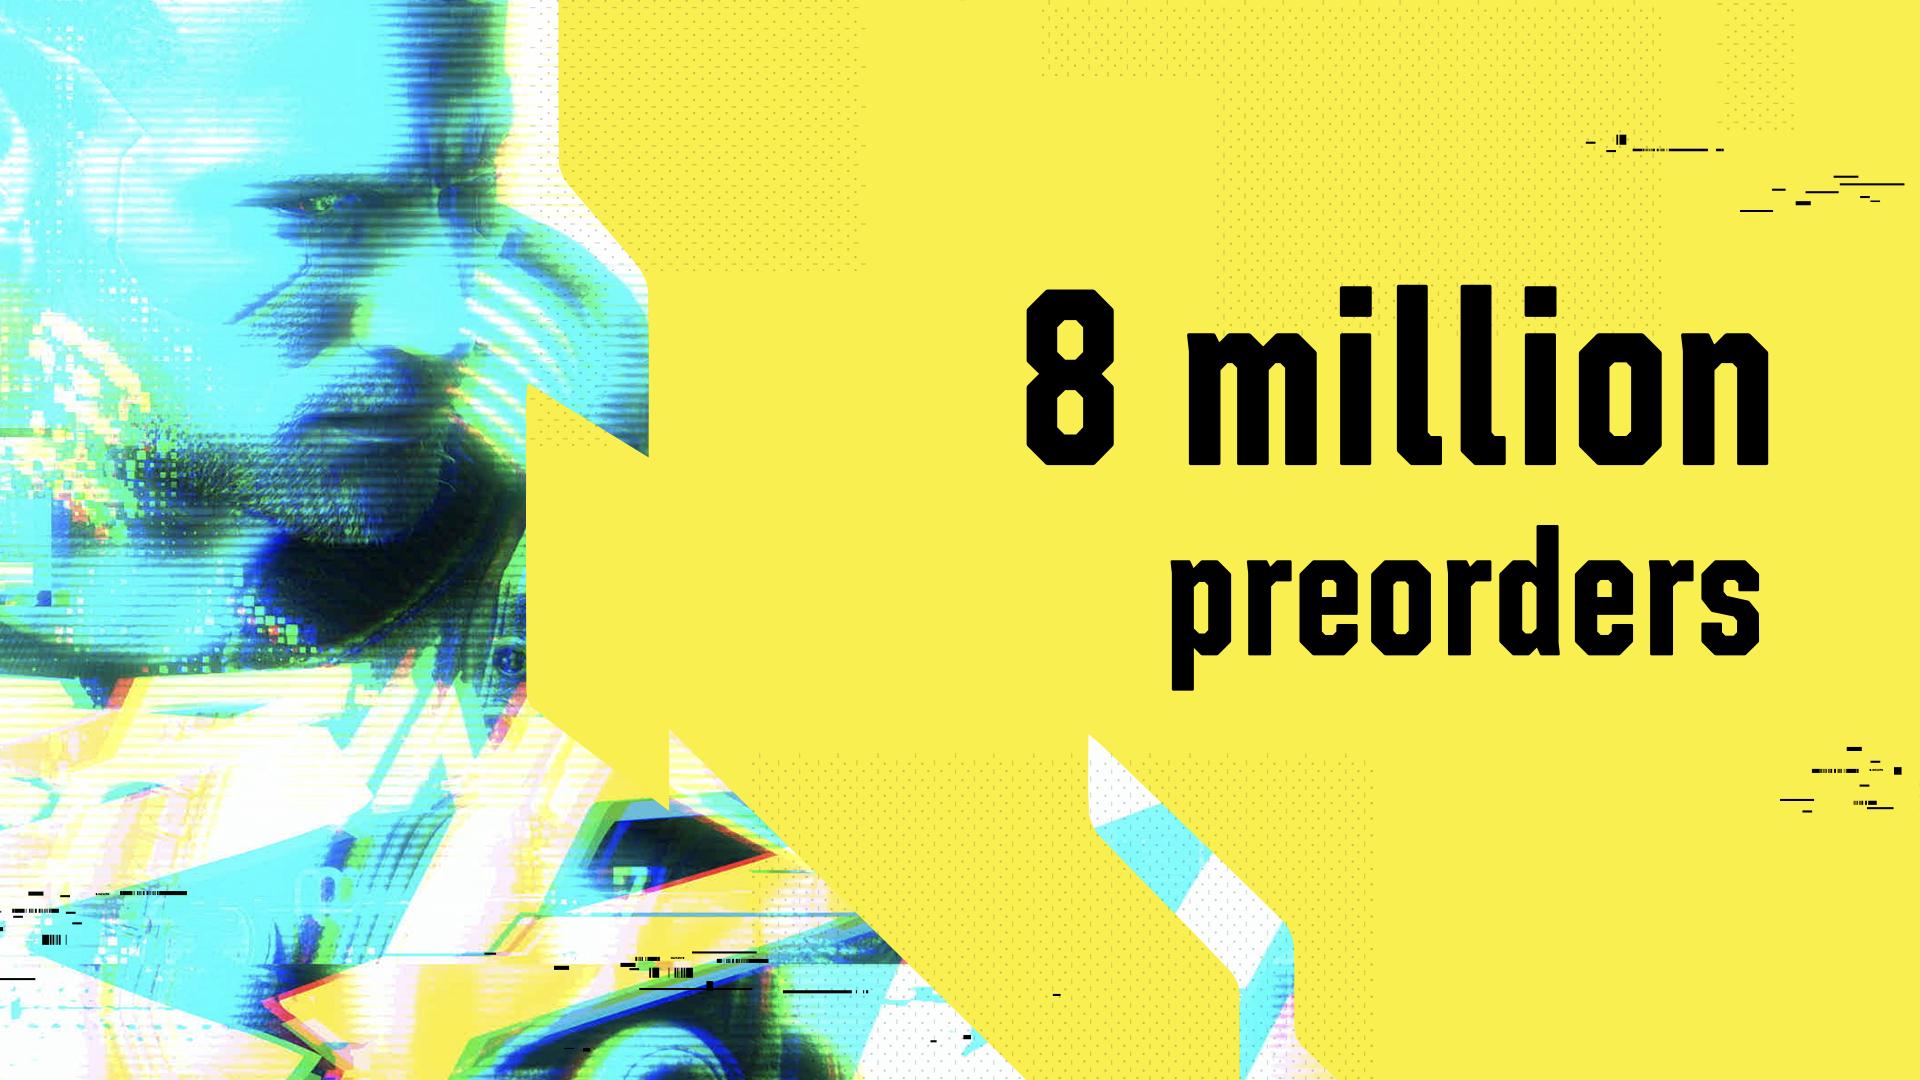 Cyberpunk 2077 è arrivato a 8 milioni di preordini